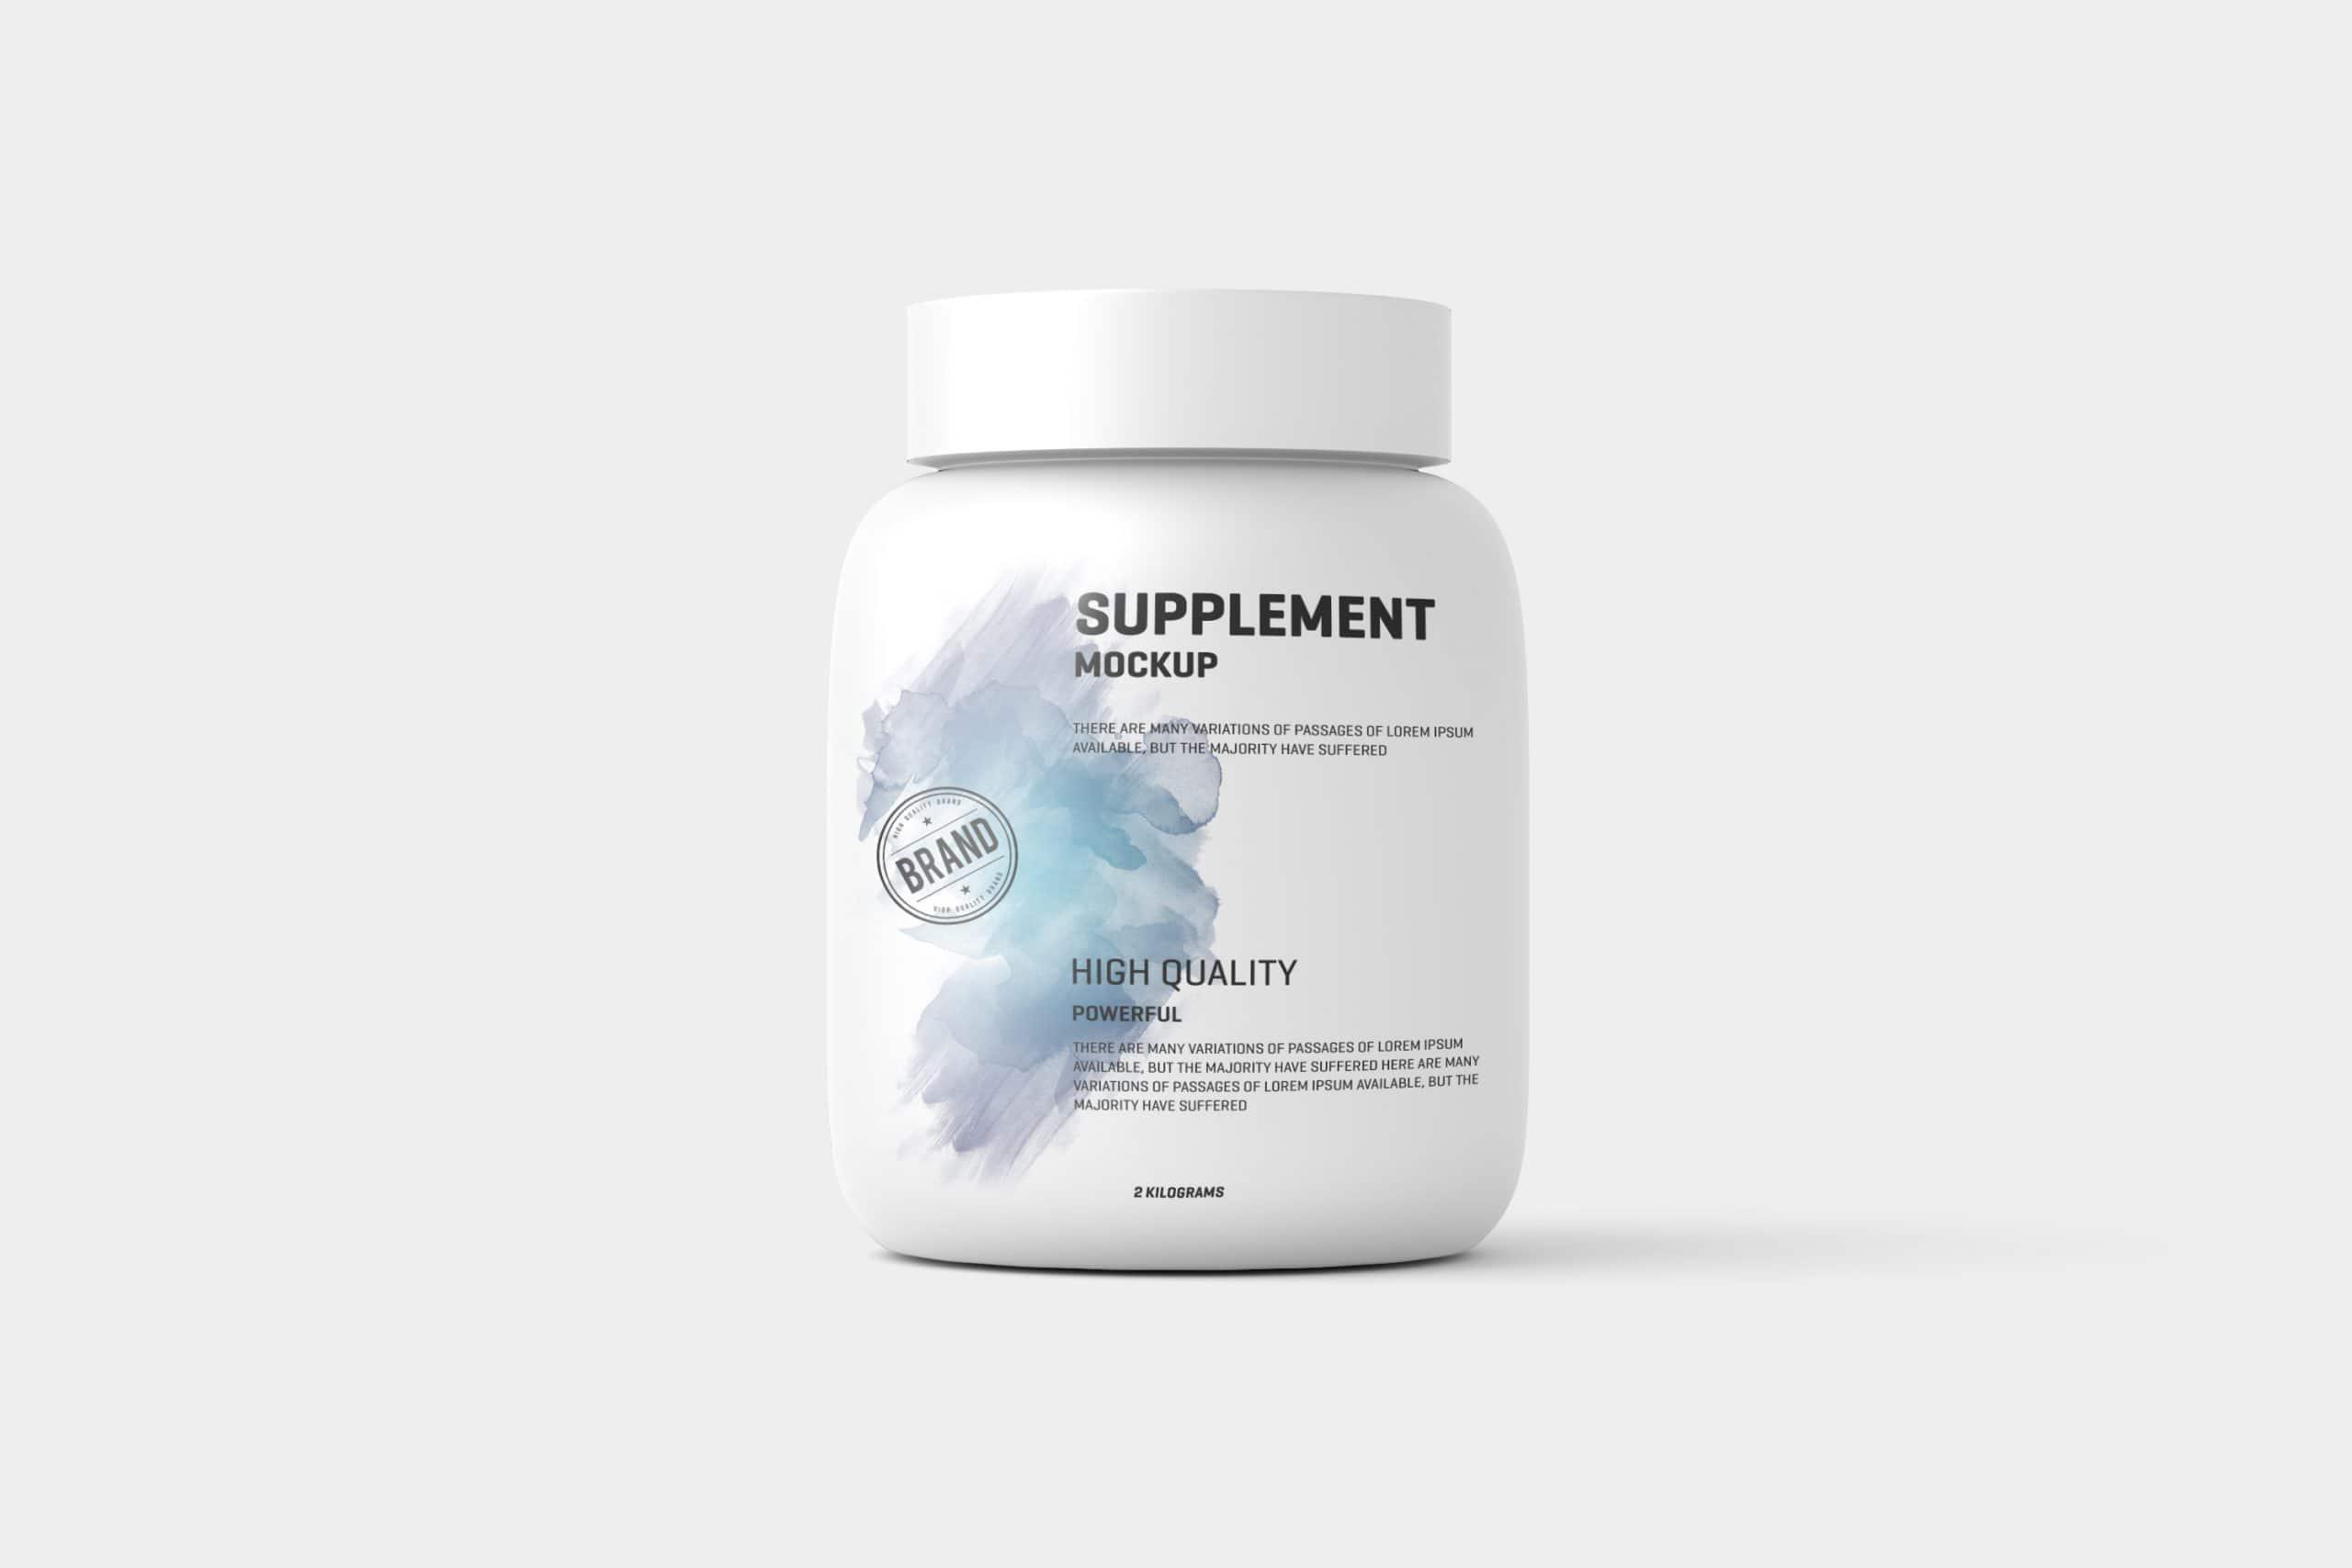 Supplement / Protein Jar Label Mockup